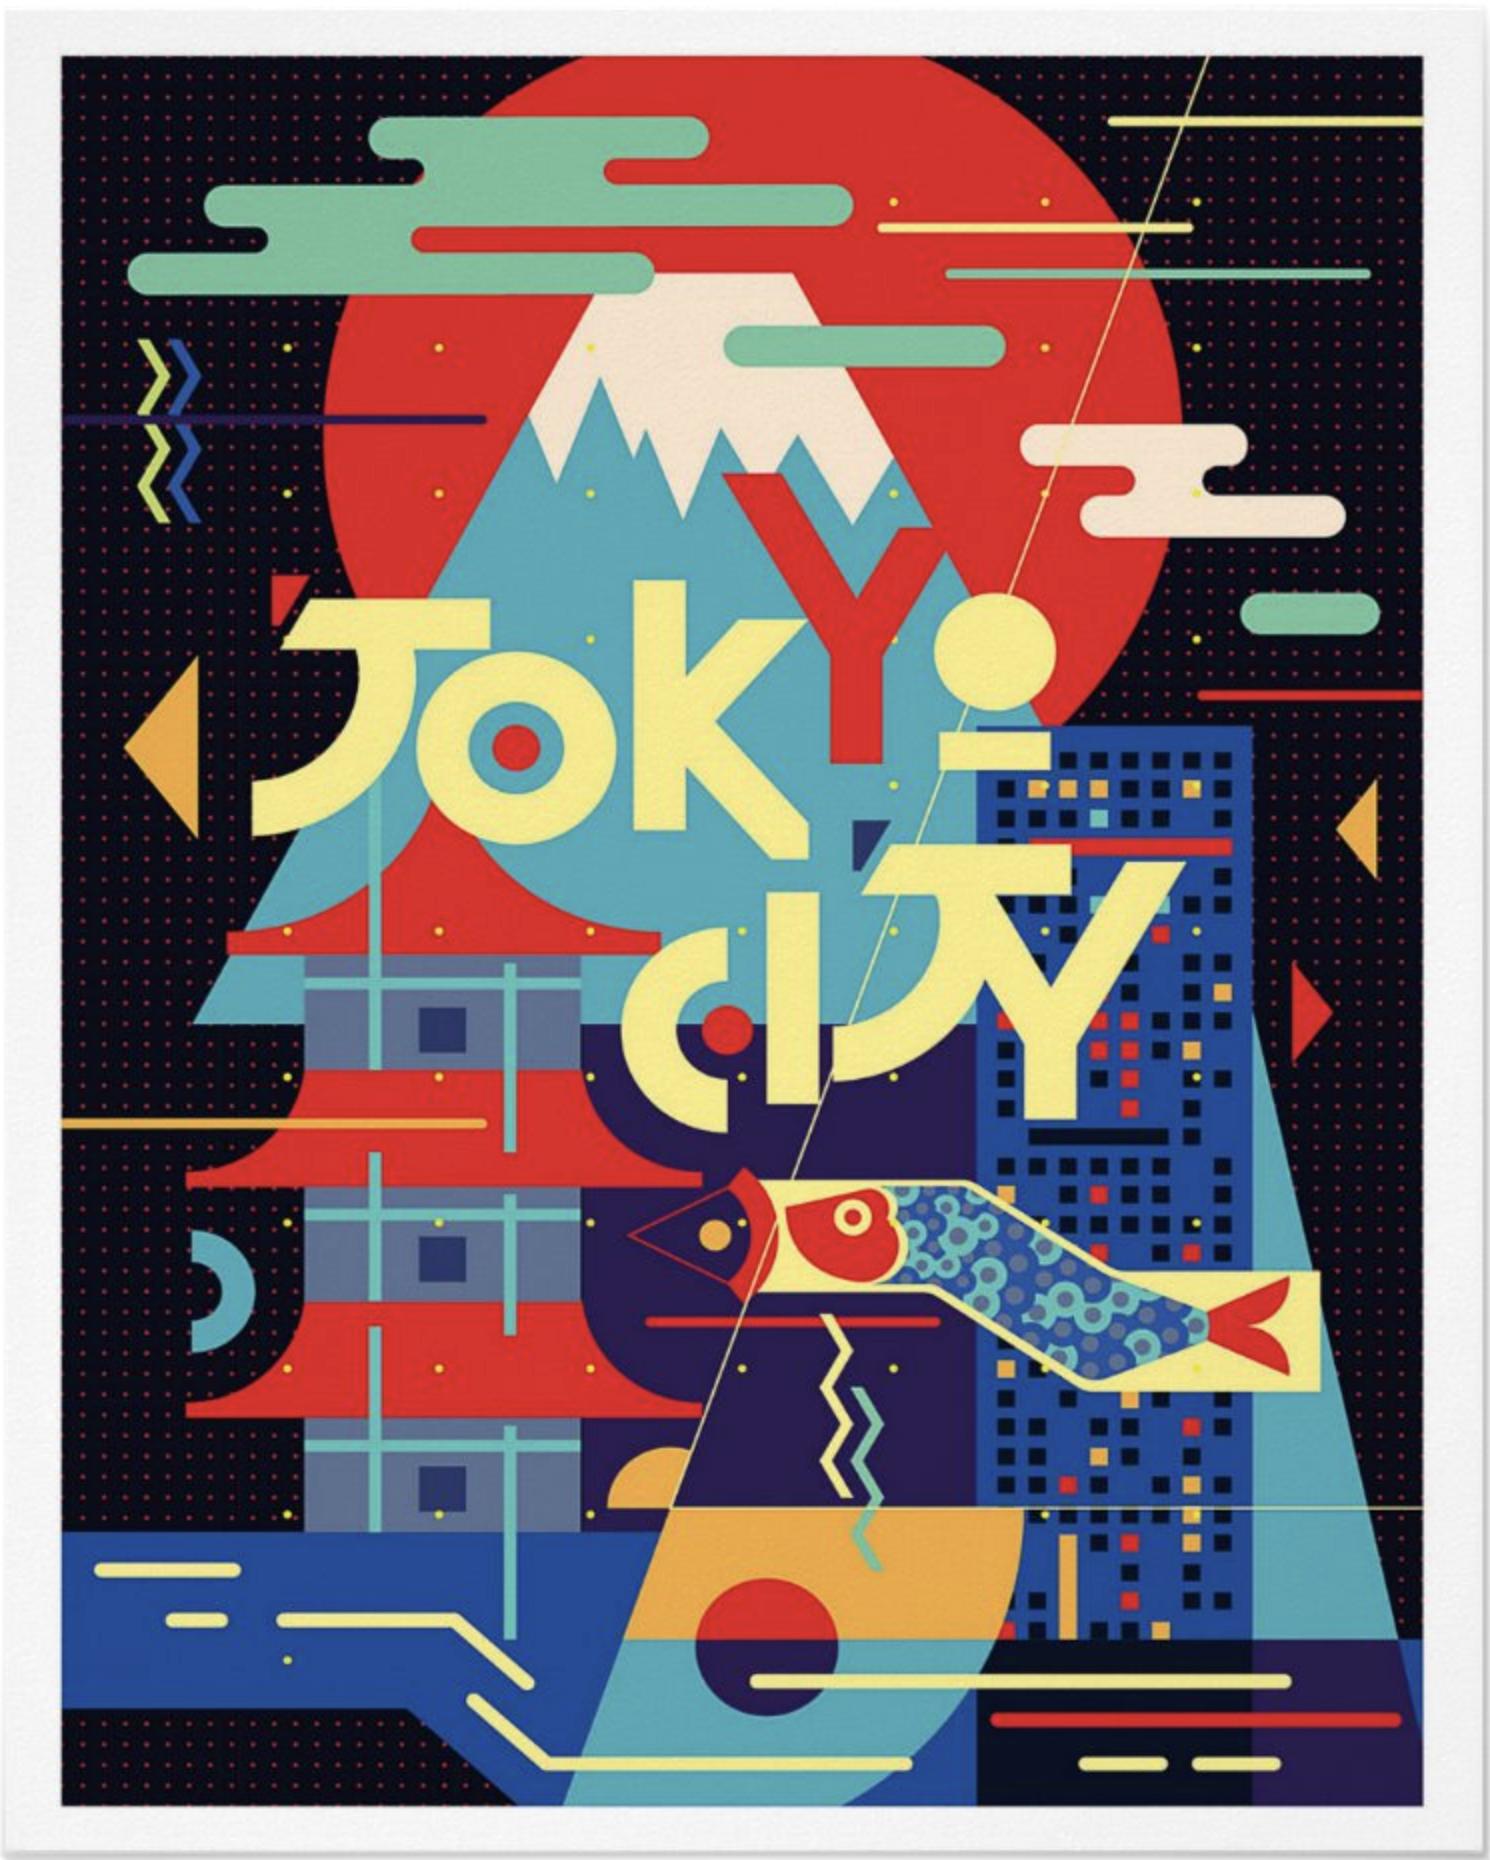 Tokyo Graphic Vintage Illustration Poster In 2020 Graphic Design Posters Japanese Graphic Design Graphic Poster